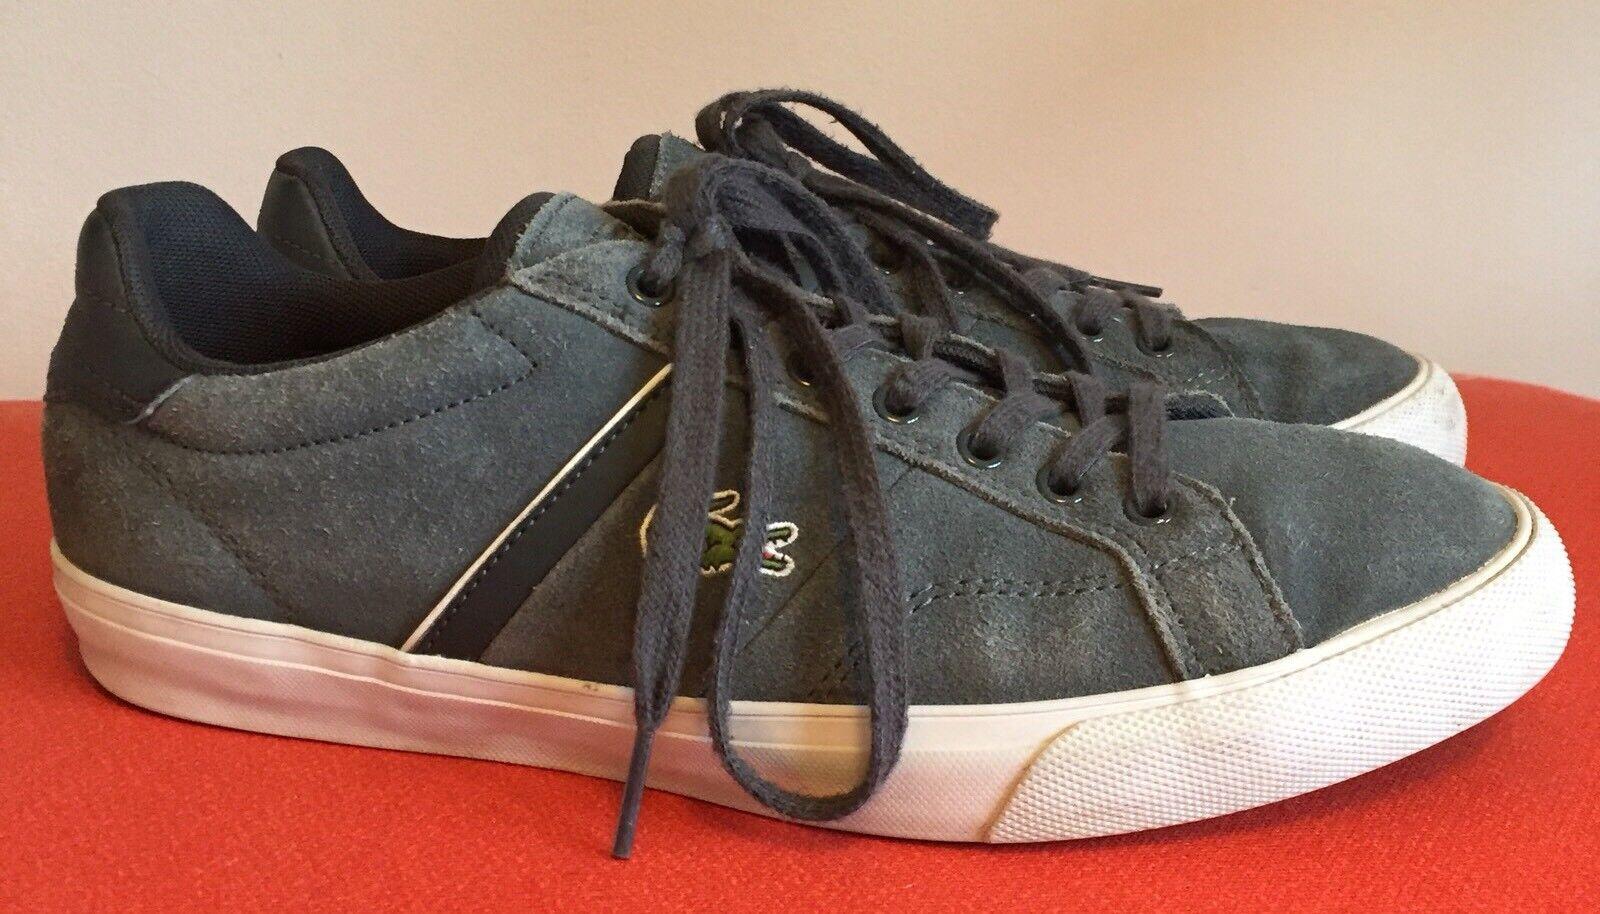 e1c7c6ab9a49f Lacoste Trainers Sport. Grey. Size 7 Mens npssoj131-Trainers ...